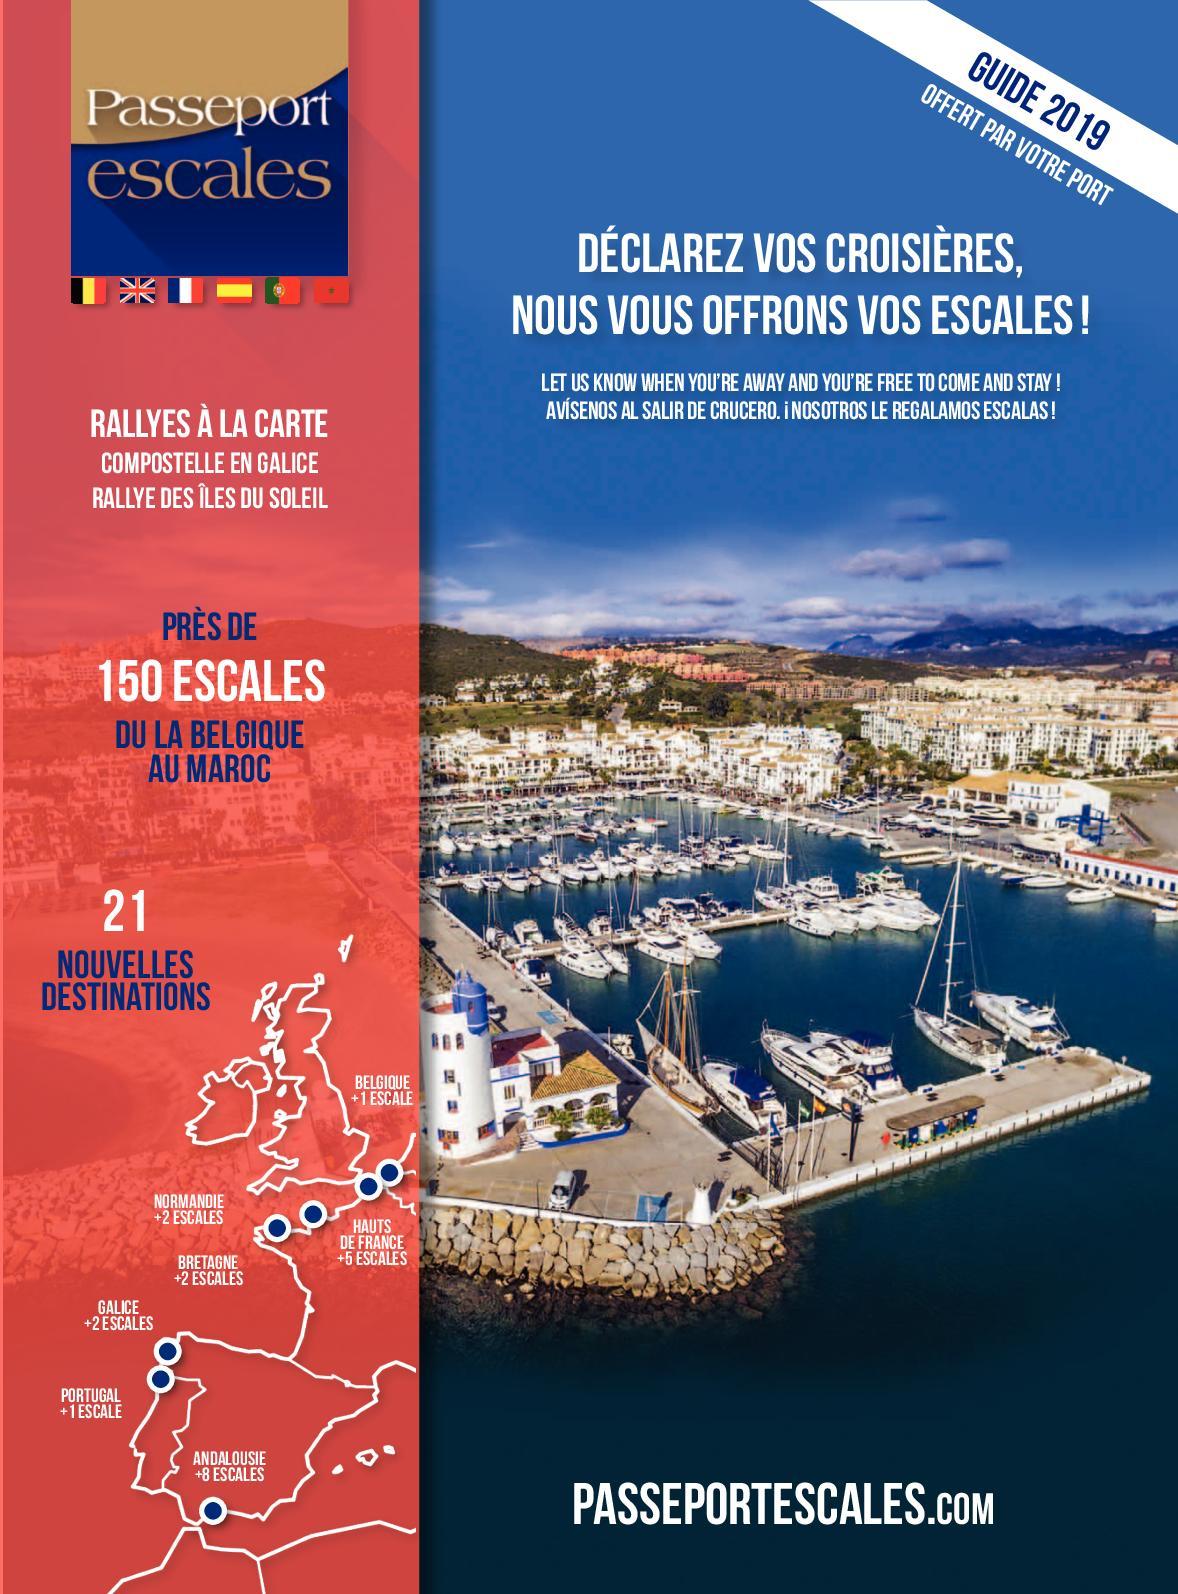 Calaméo Guide Passeport Passeport Calaméo 2019 Escales Guide wOPXiTZku